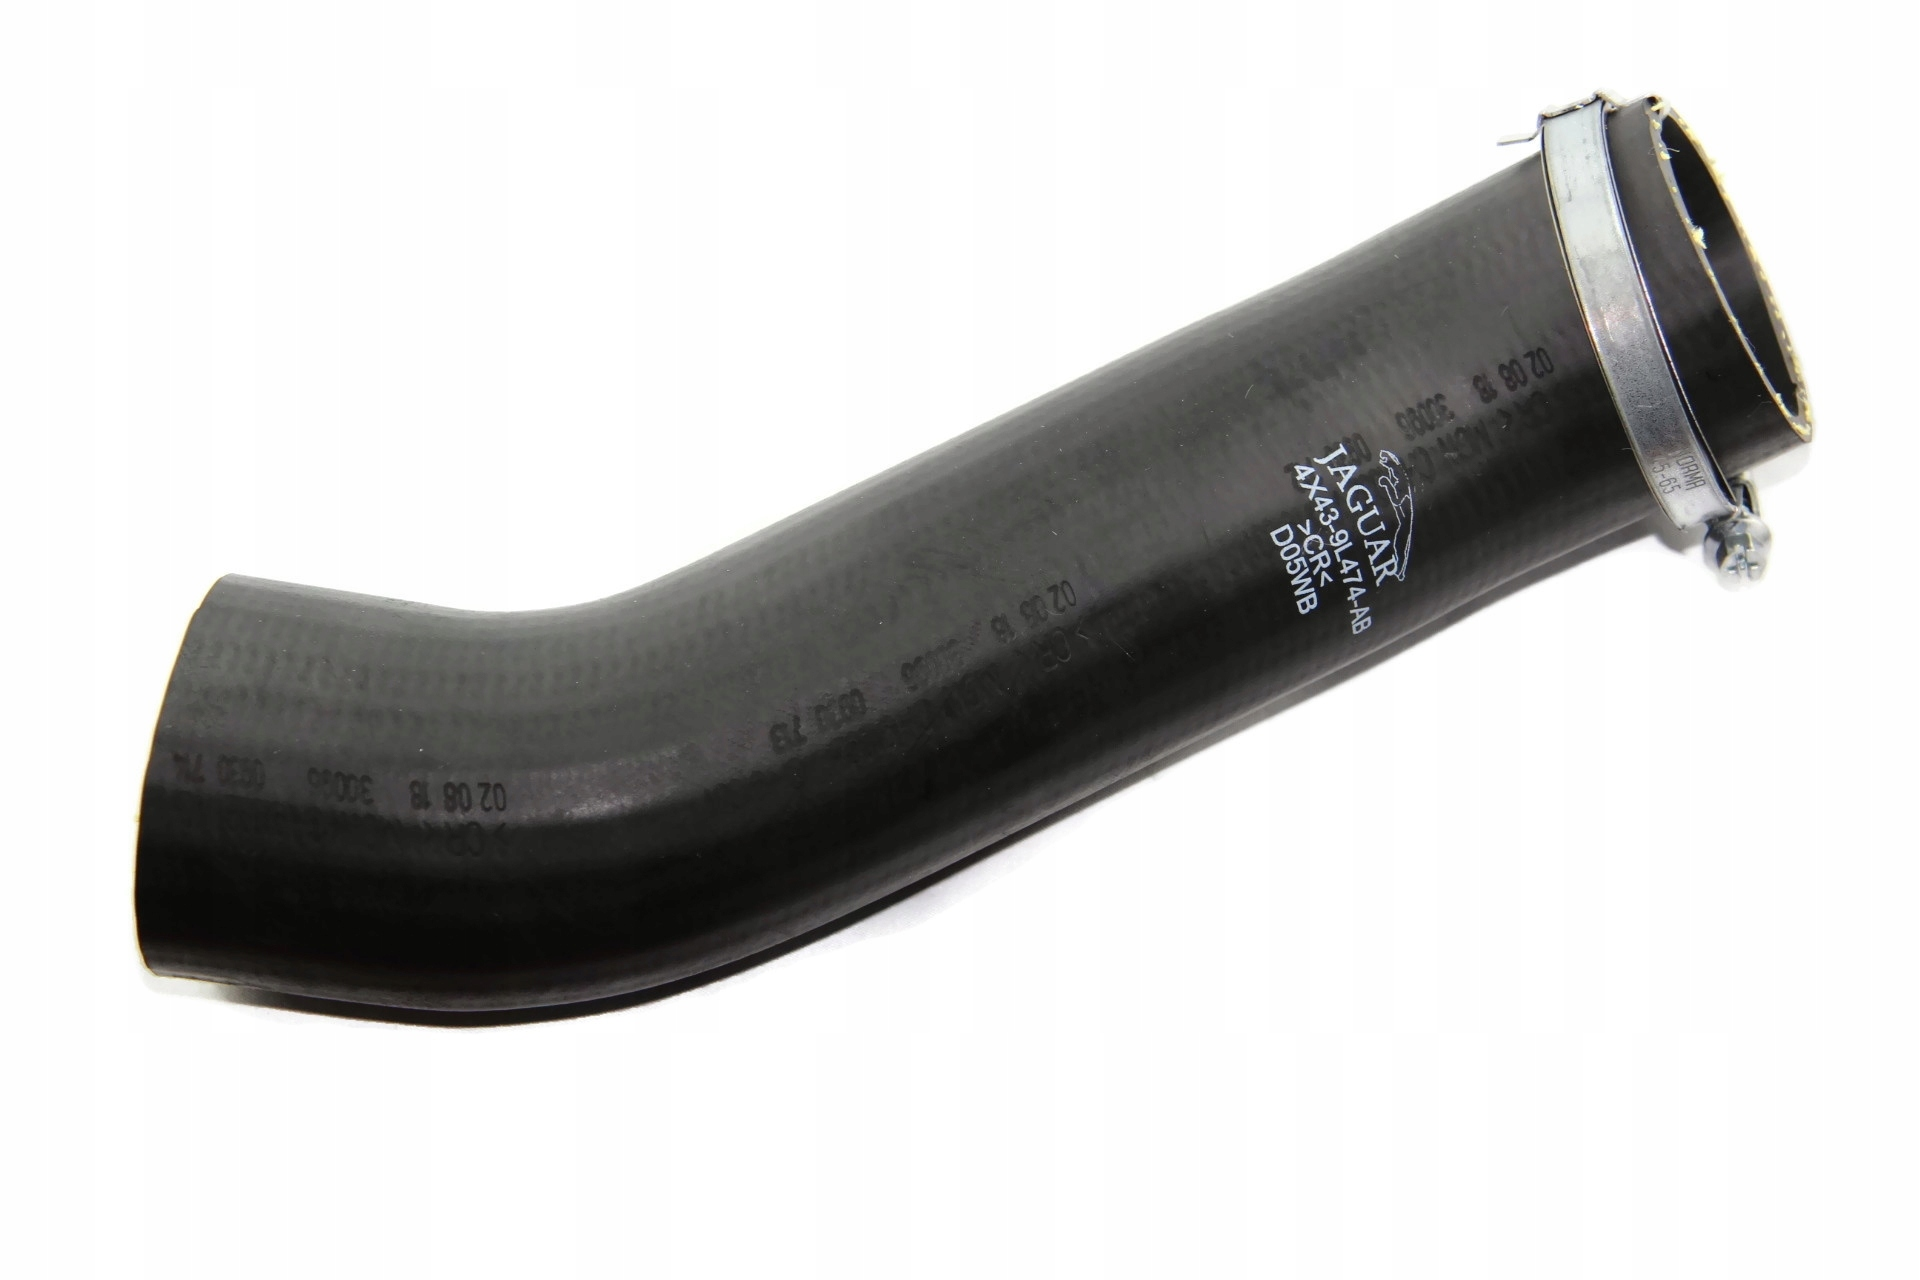 труба интеркулер права верхняя без dpf оригинал